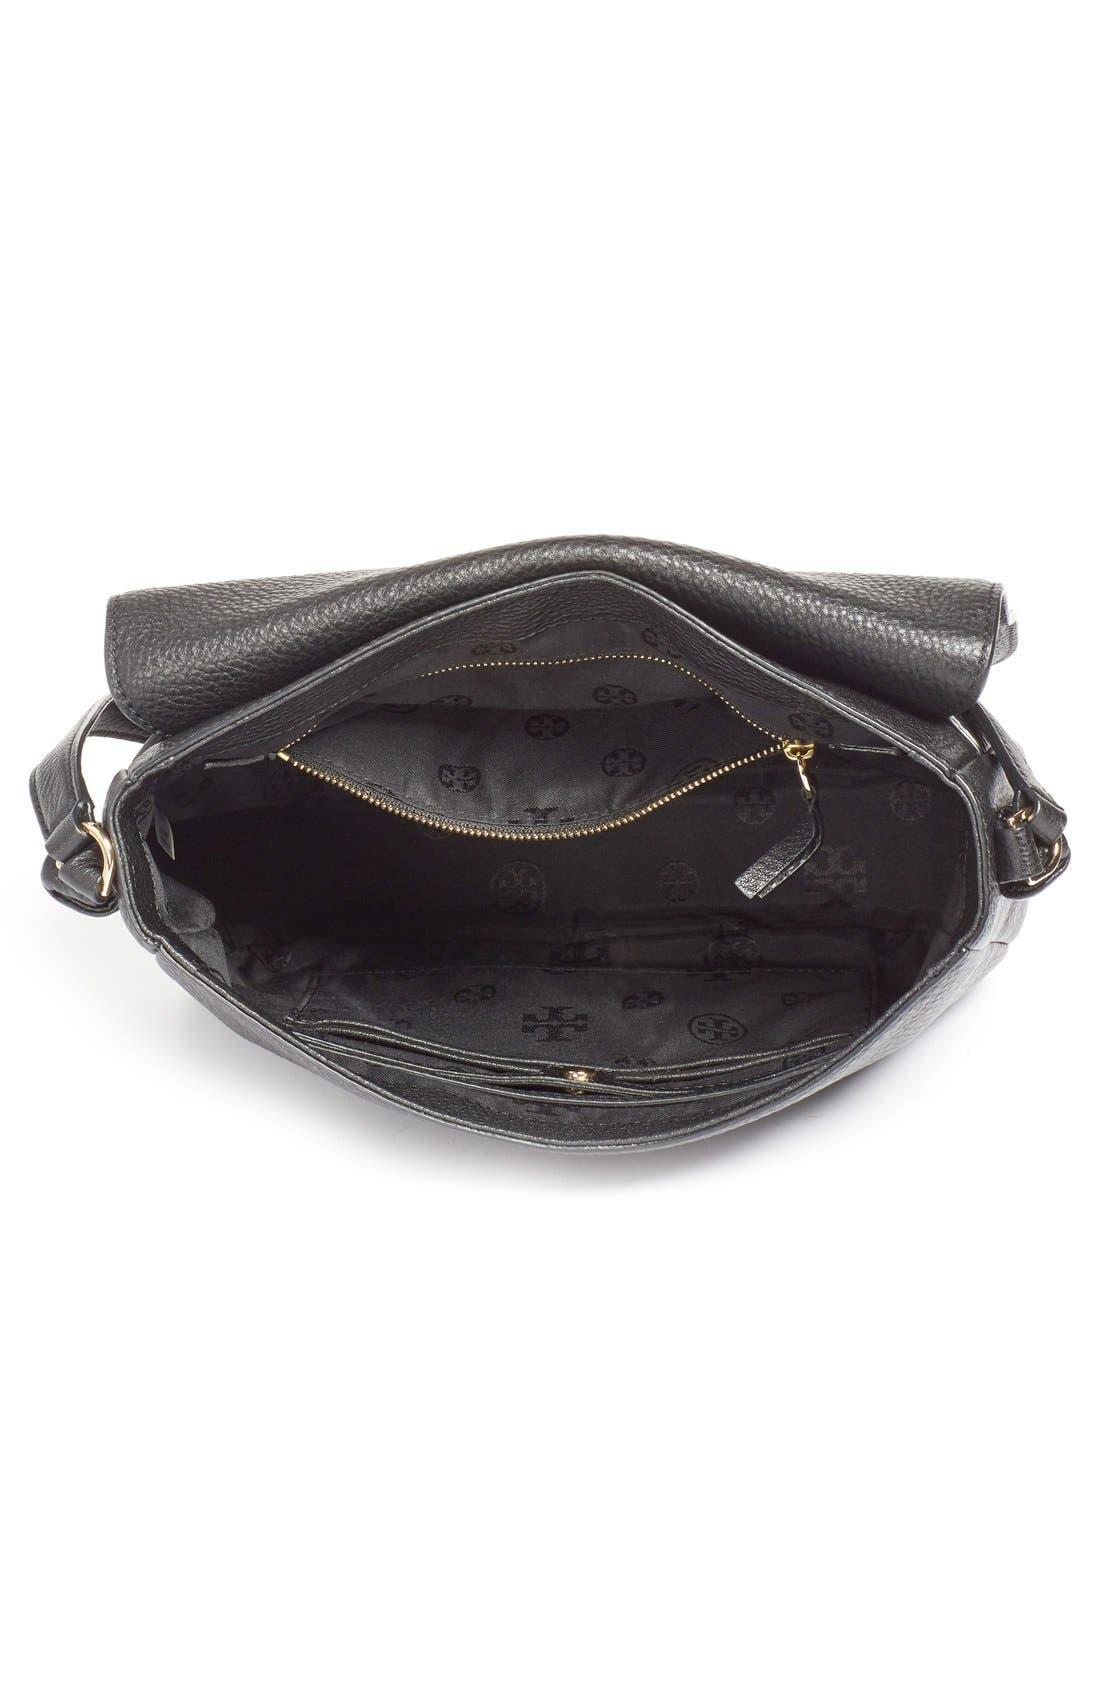 'Harper' Leather Crossbody Bag,                             Alternate thumbnail 2, color,                             012